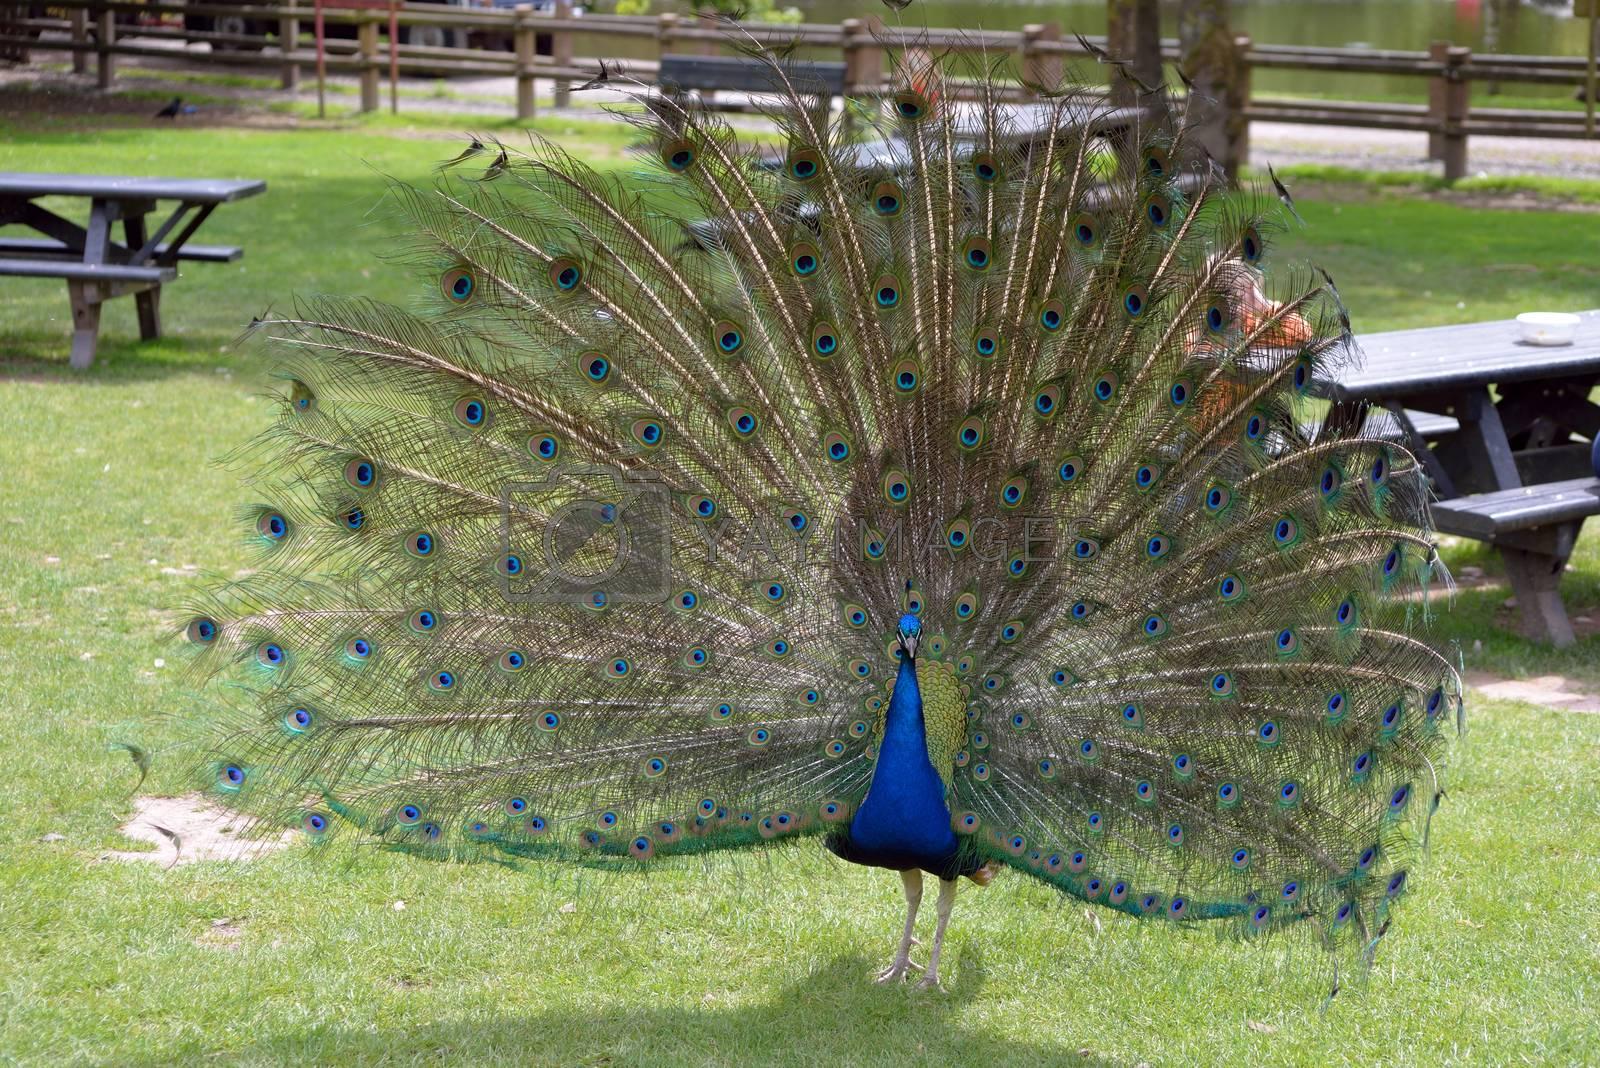 peacock in fota wildlife park near cobh county cork ireland